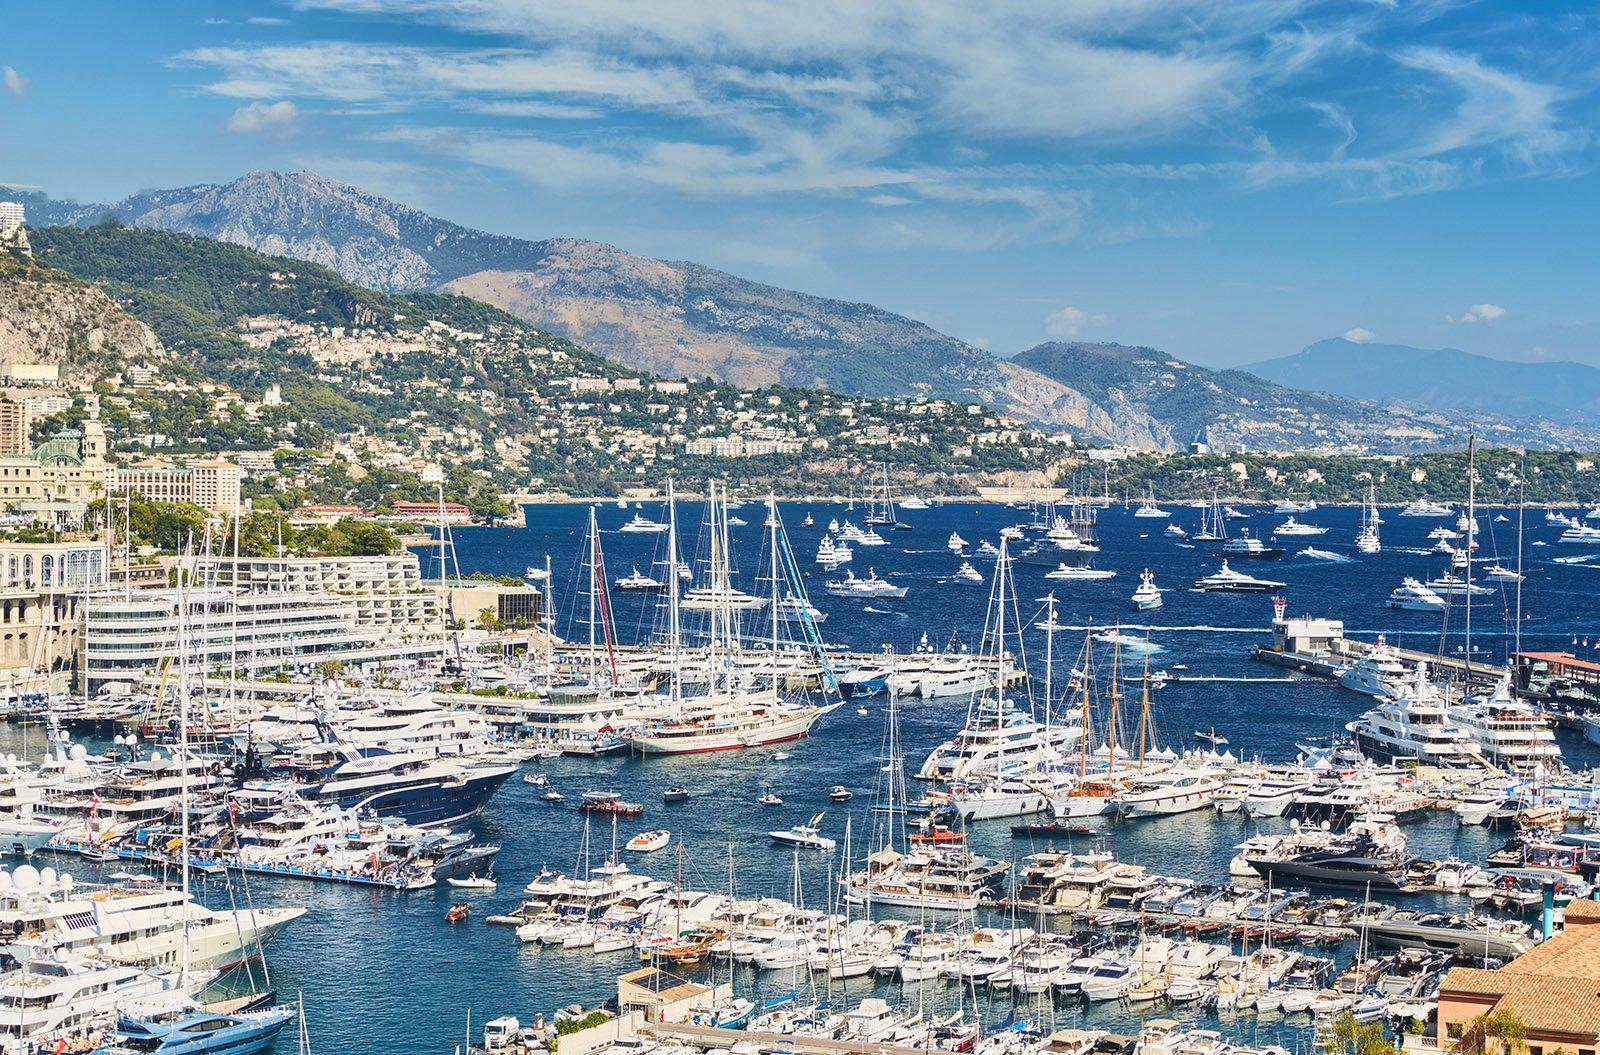 Luxury Yachts in Monaco © Drozdin Vladimir - Shutterstock.com